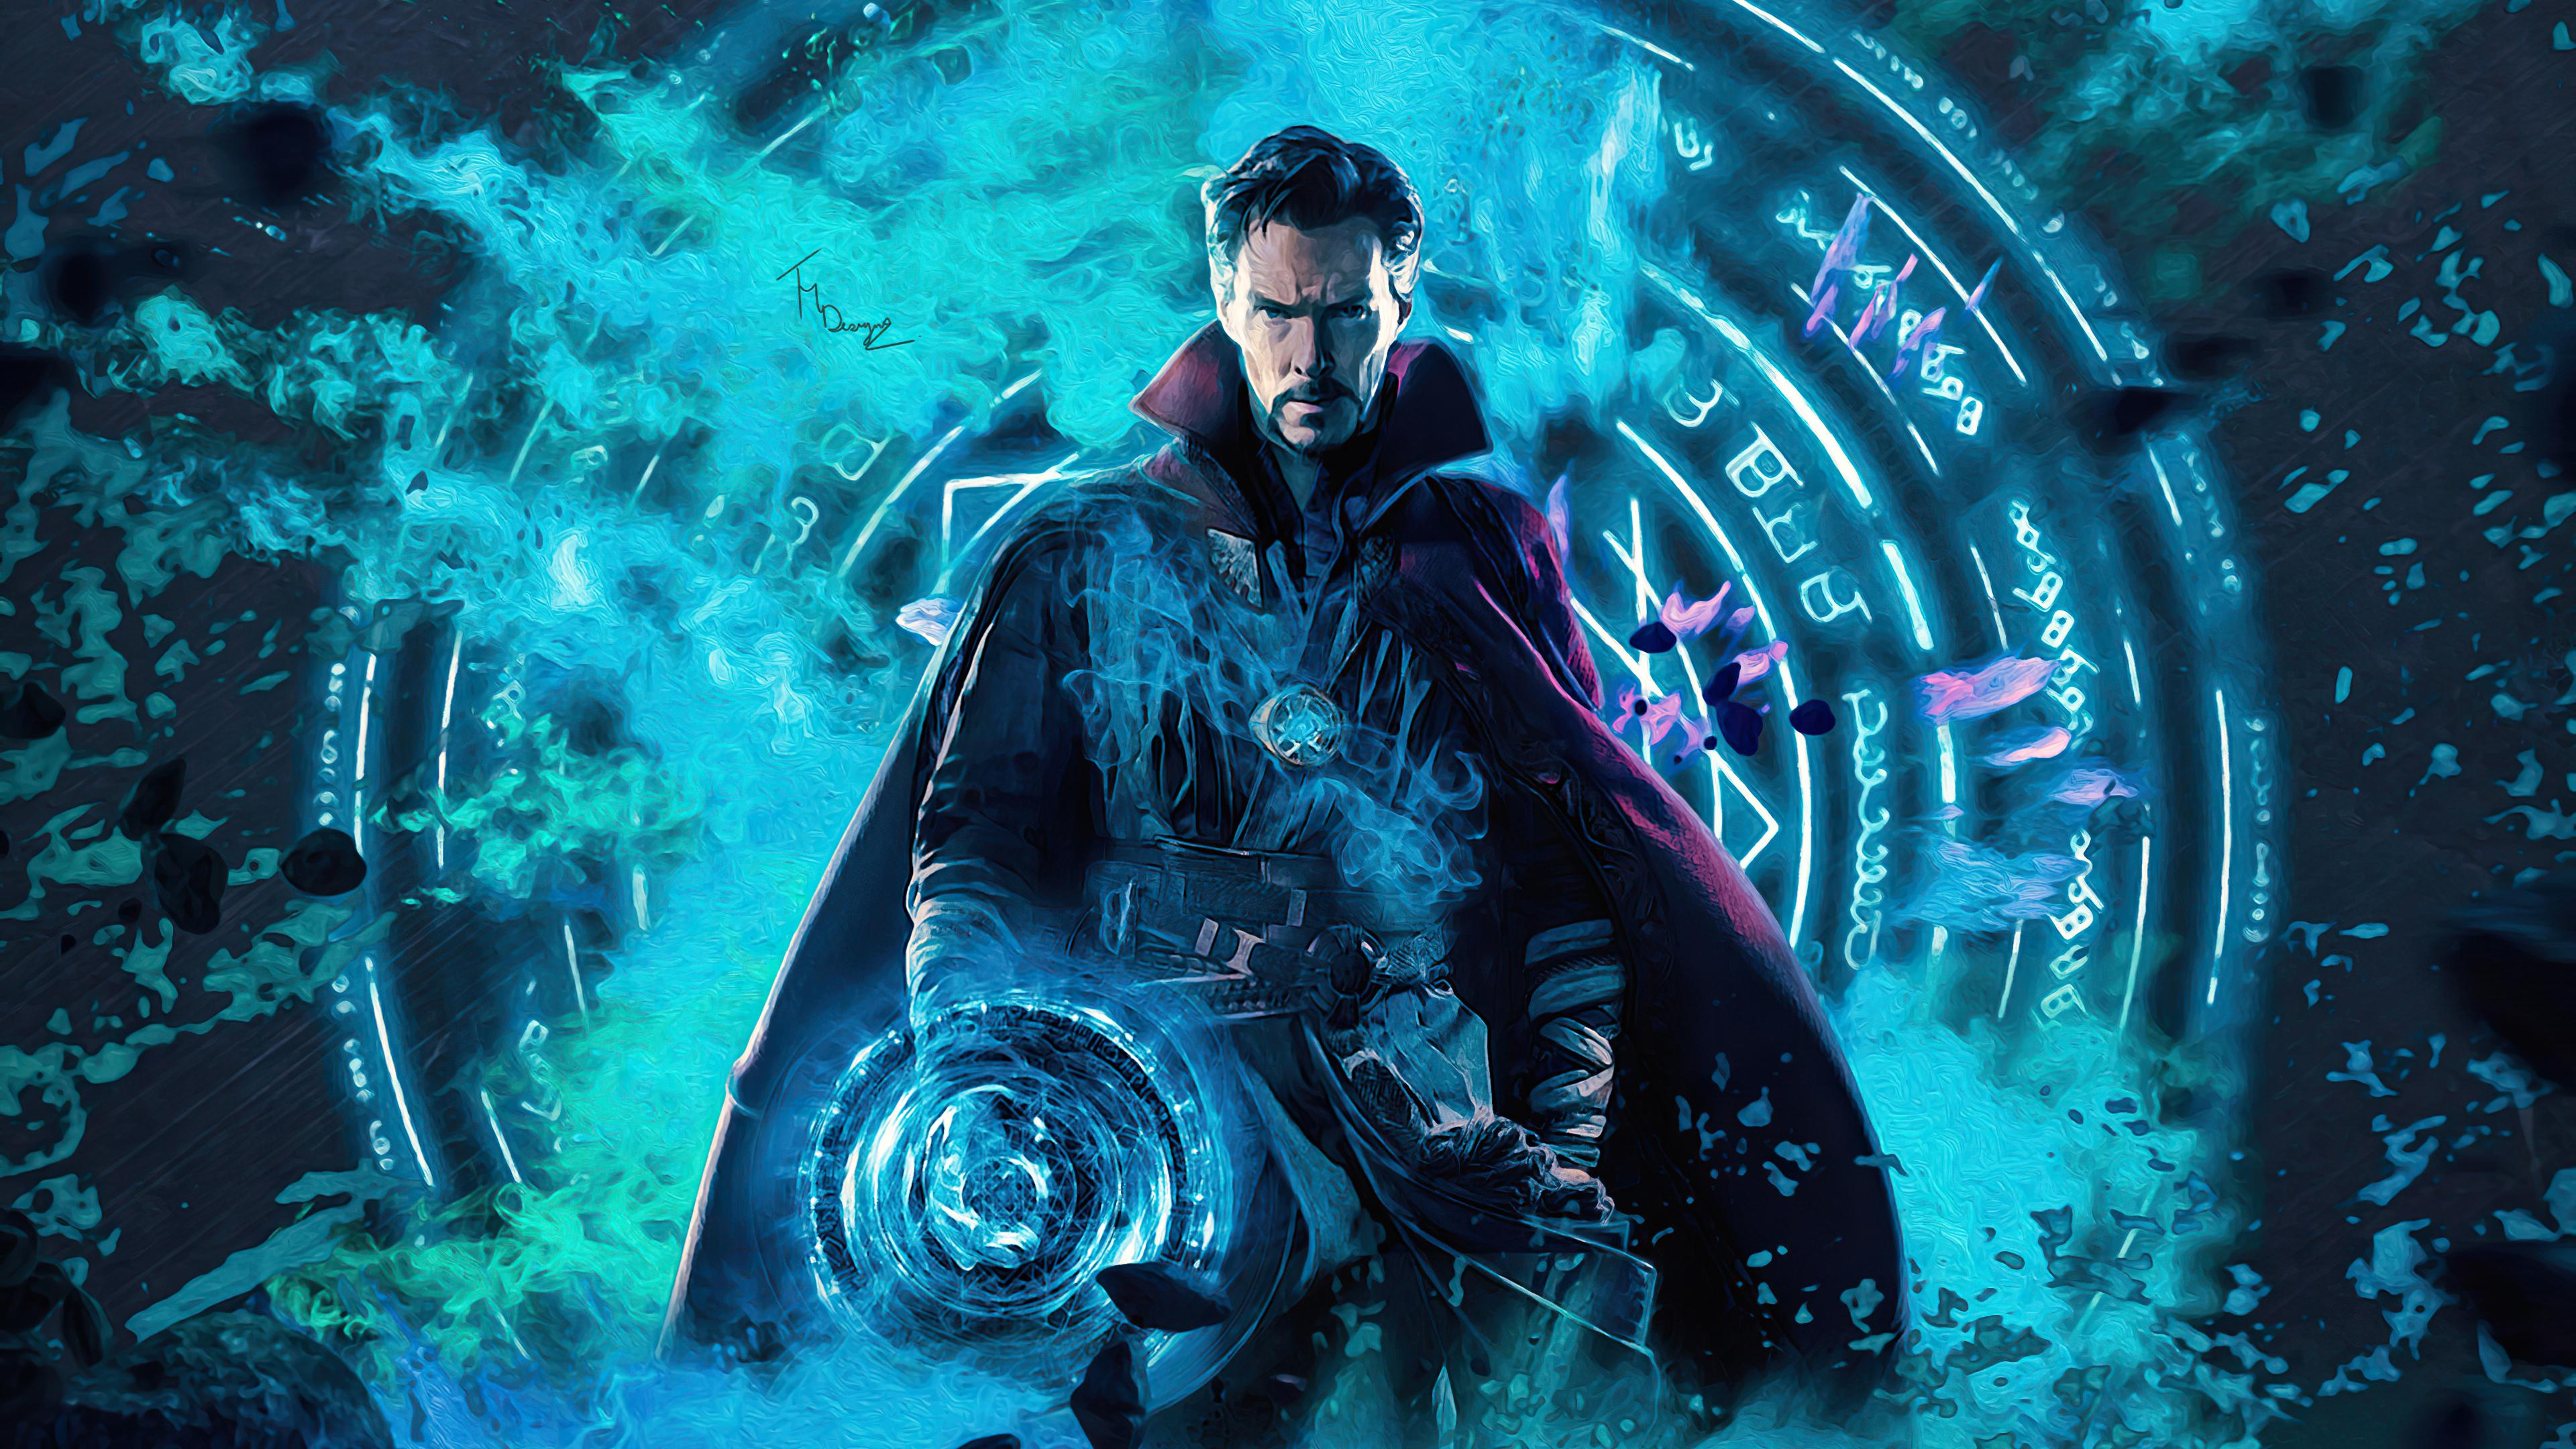 3840x2160 Doctor Strange 4k Artwork 2020 4k HD 4k ...